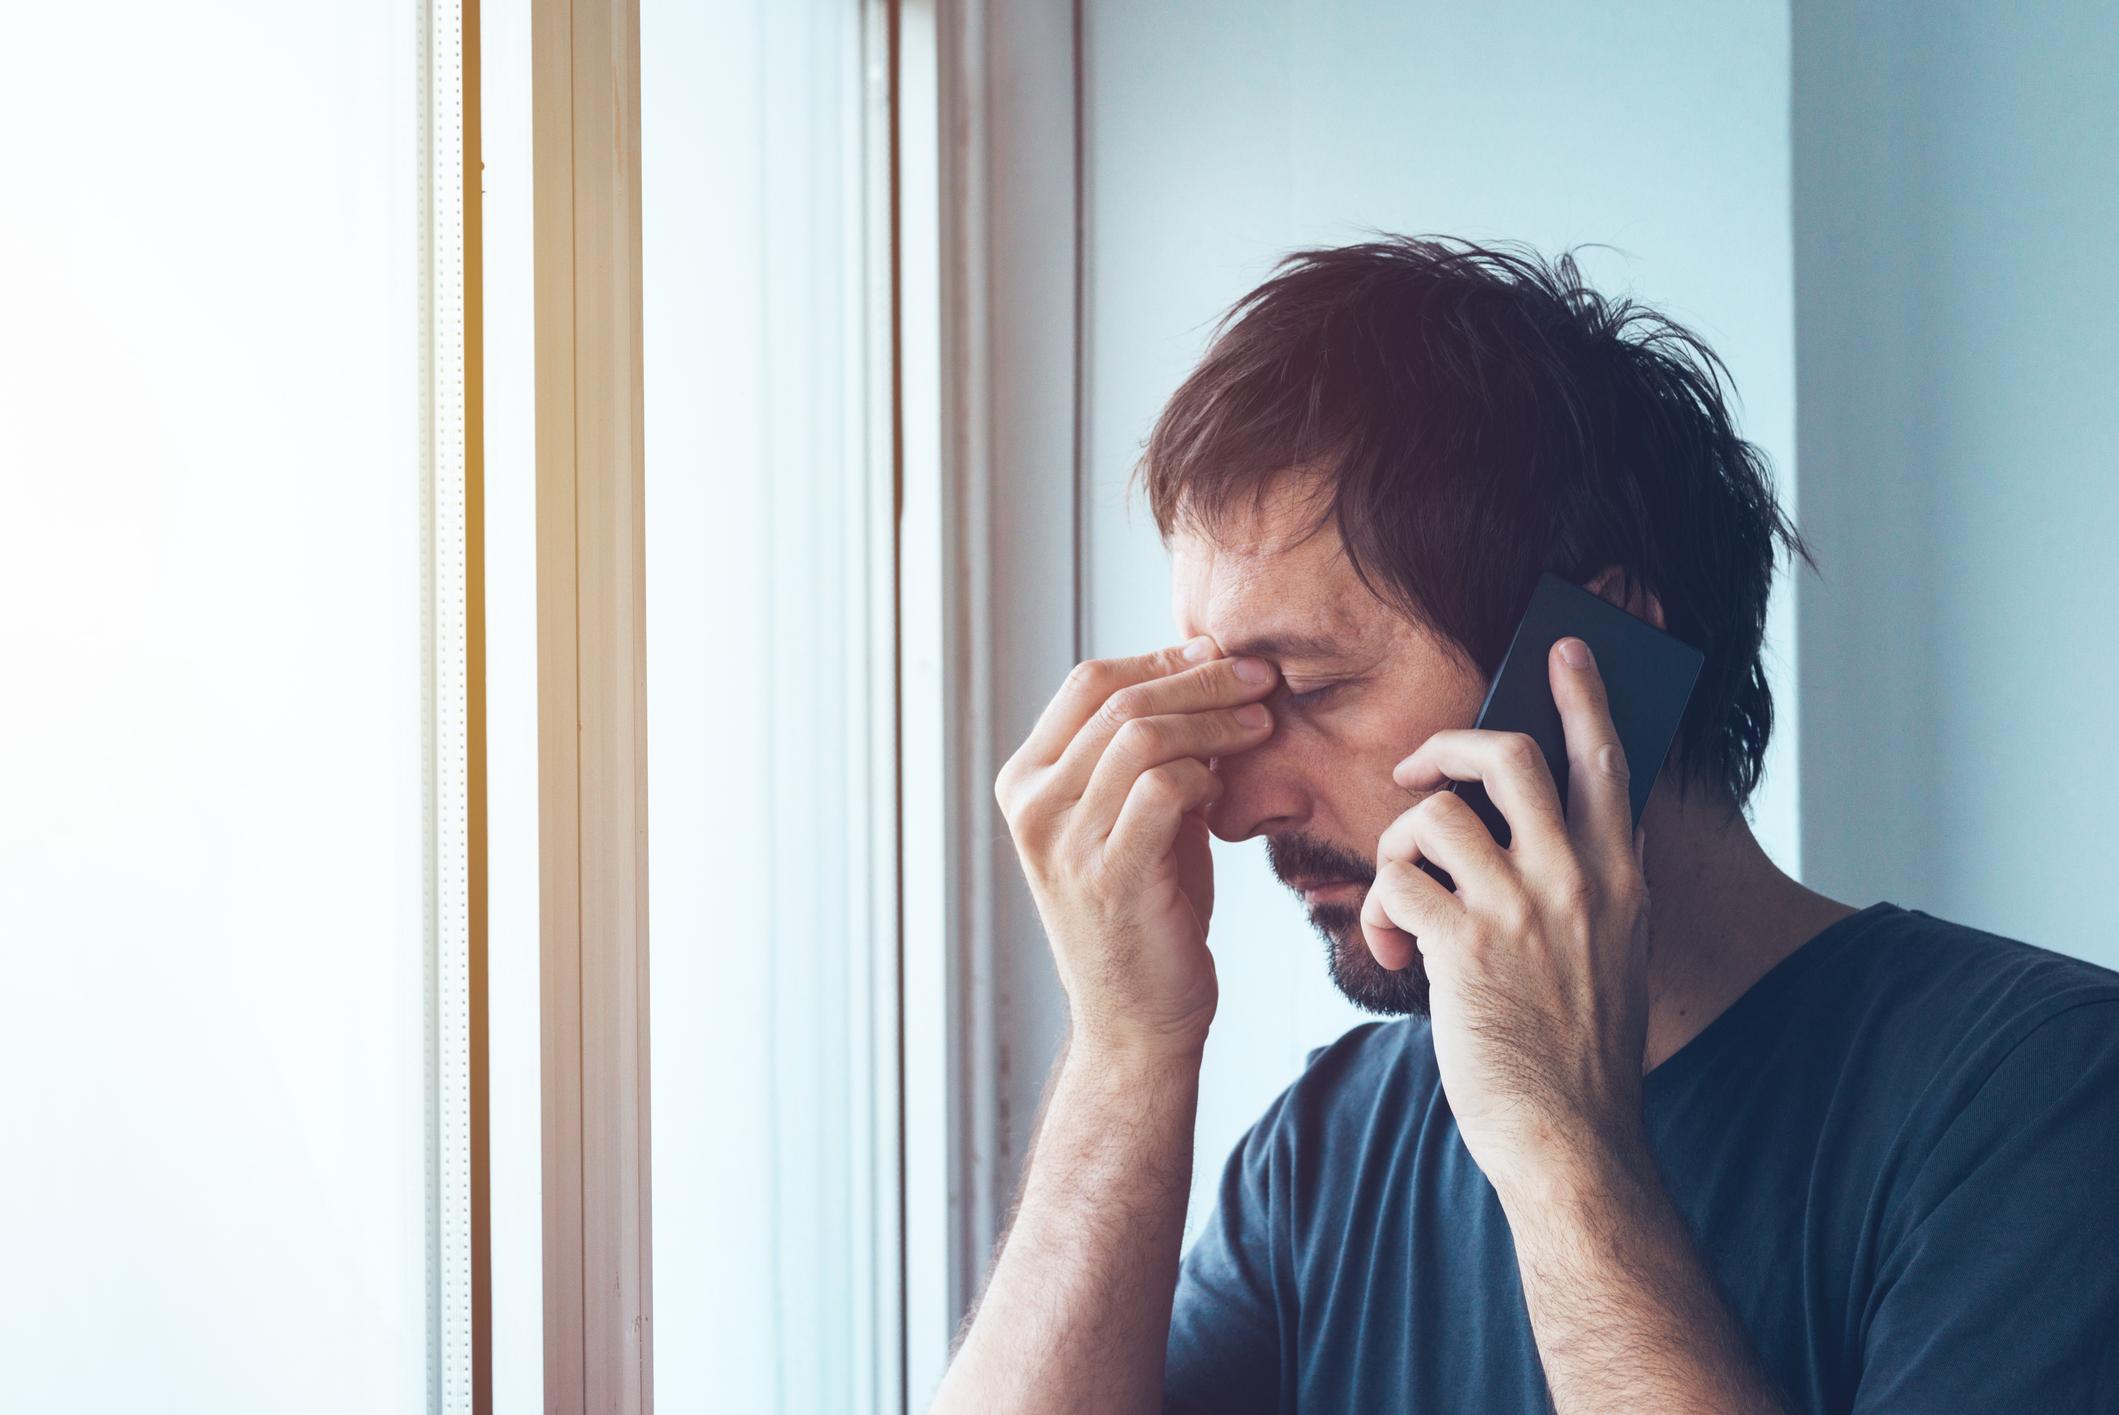 Man on telephone, pinching bridge of nose in frustration